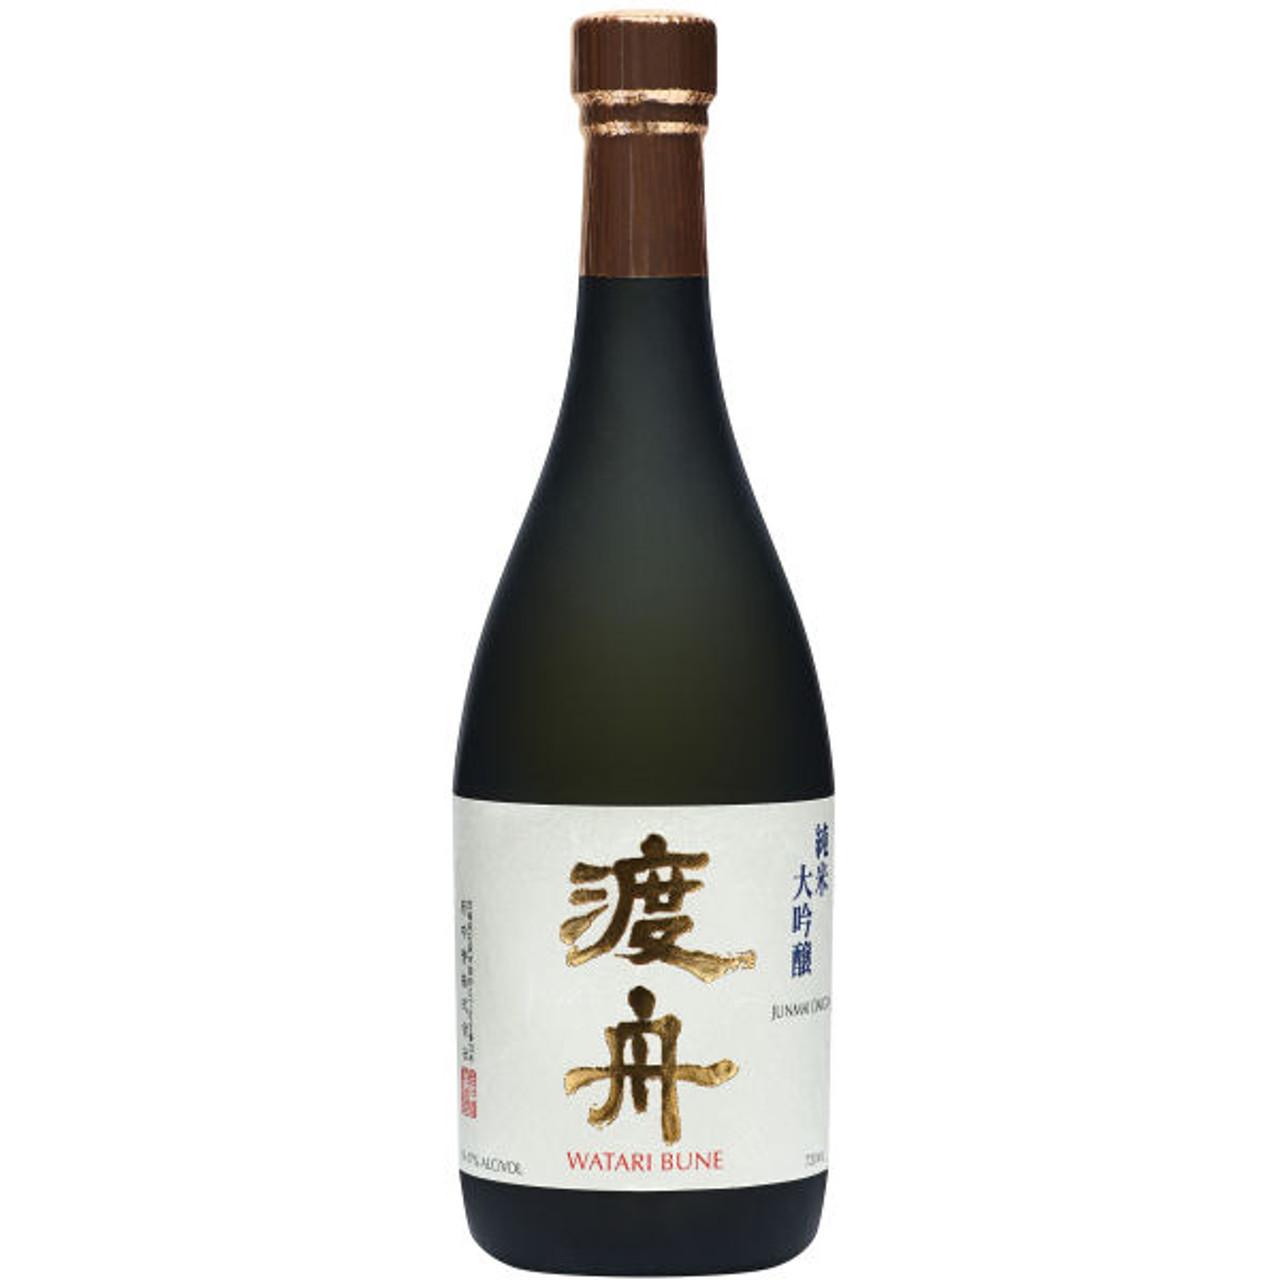 Watari Bune Liquid Gold Junmai Daiginjo Sake 720ml